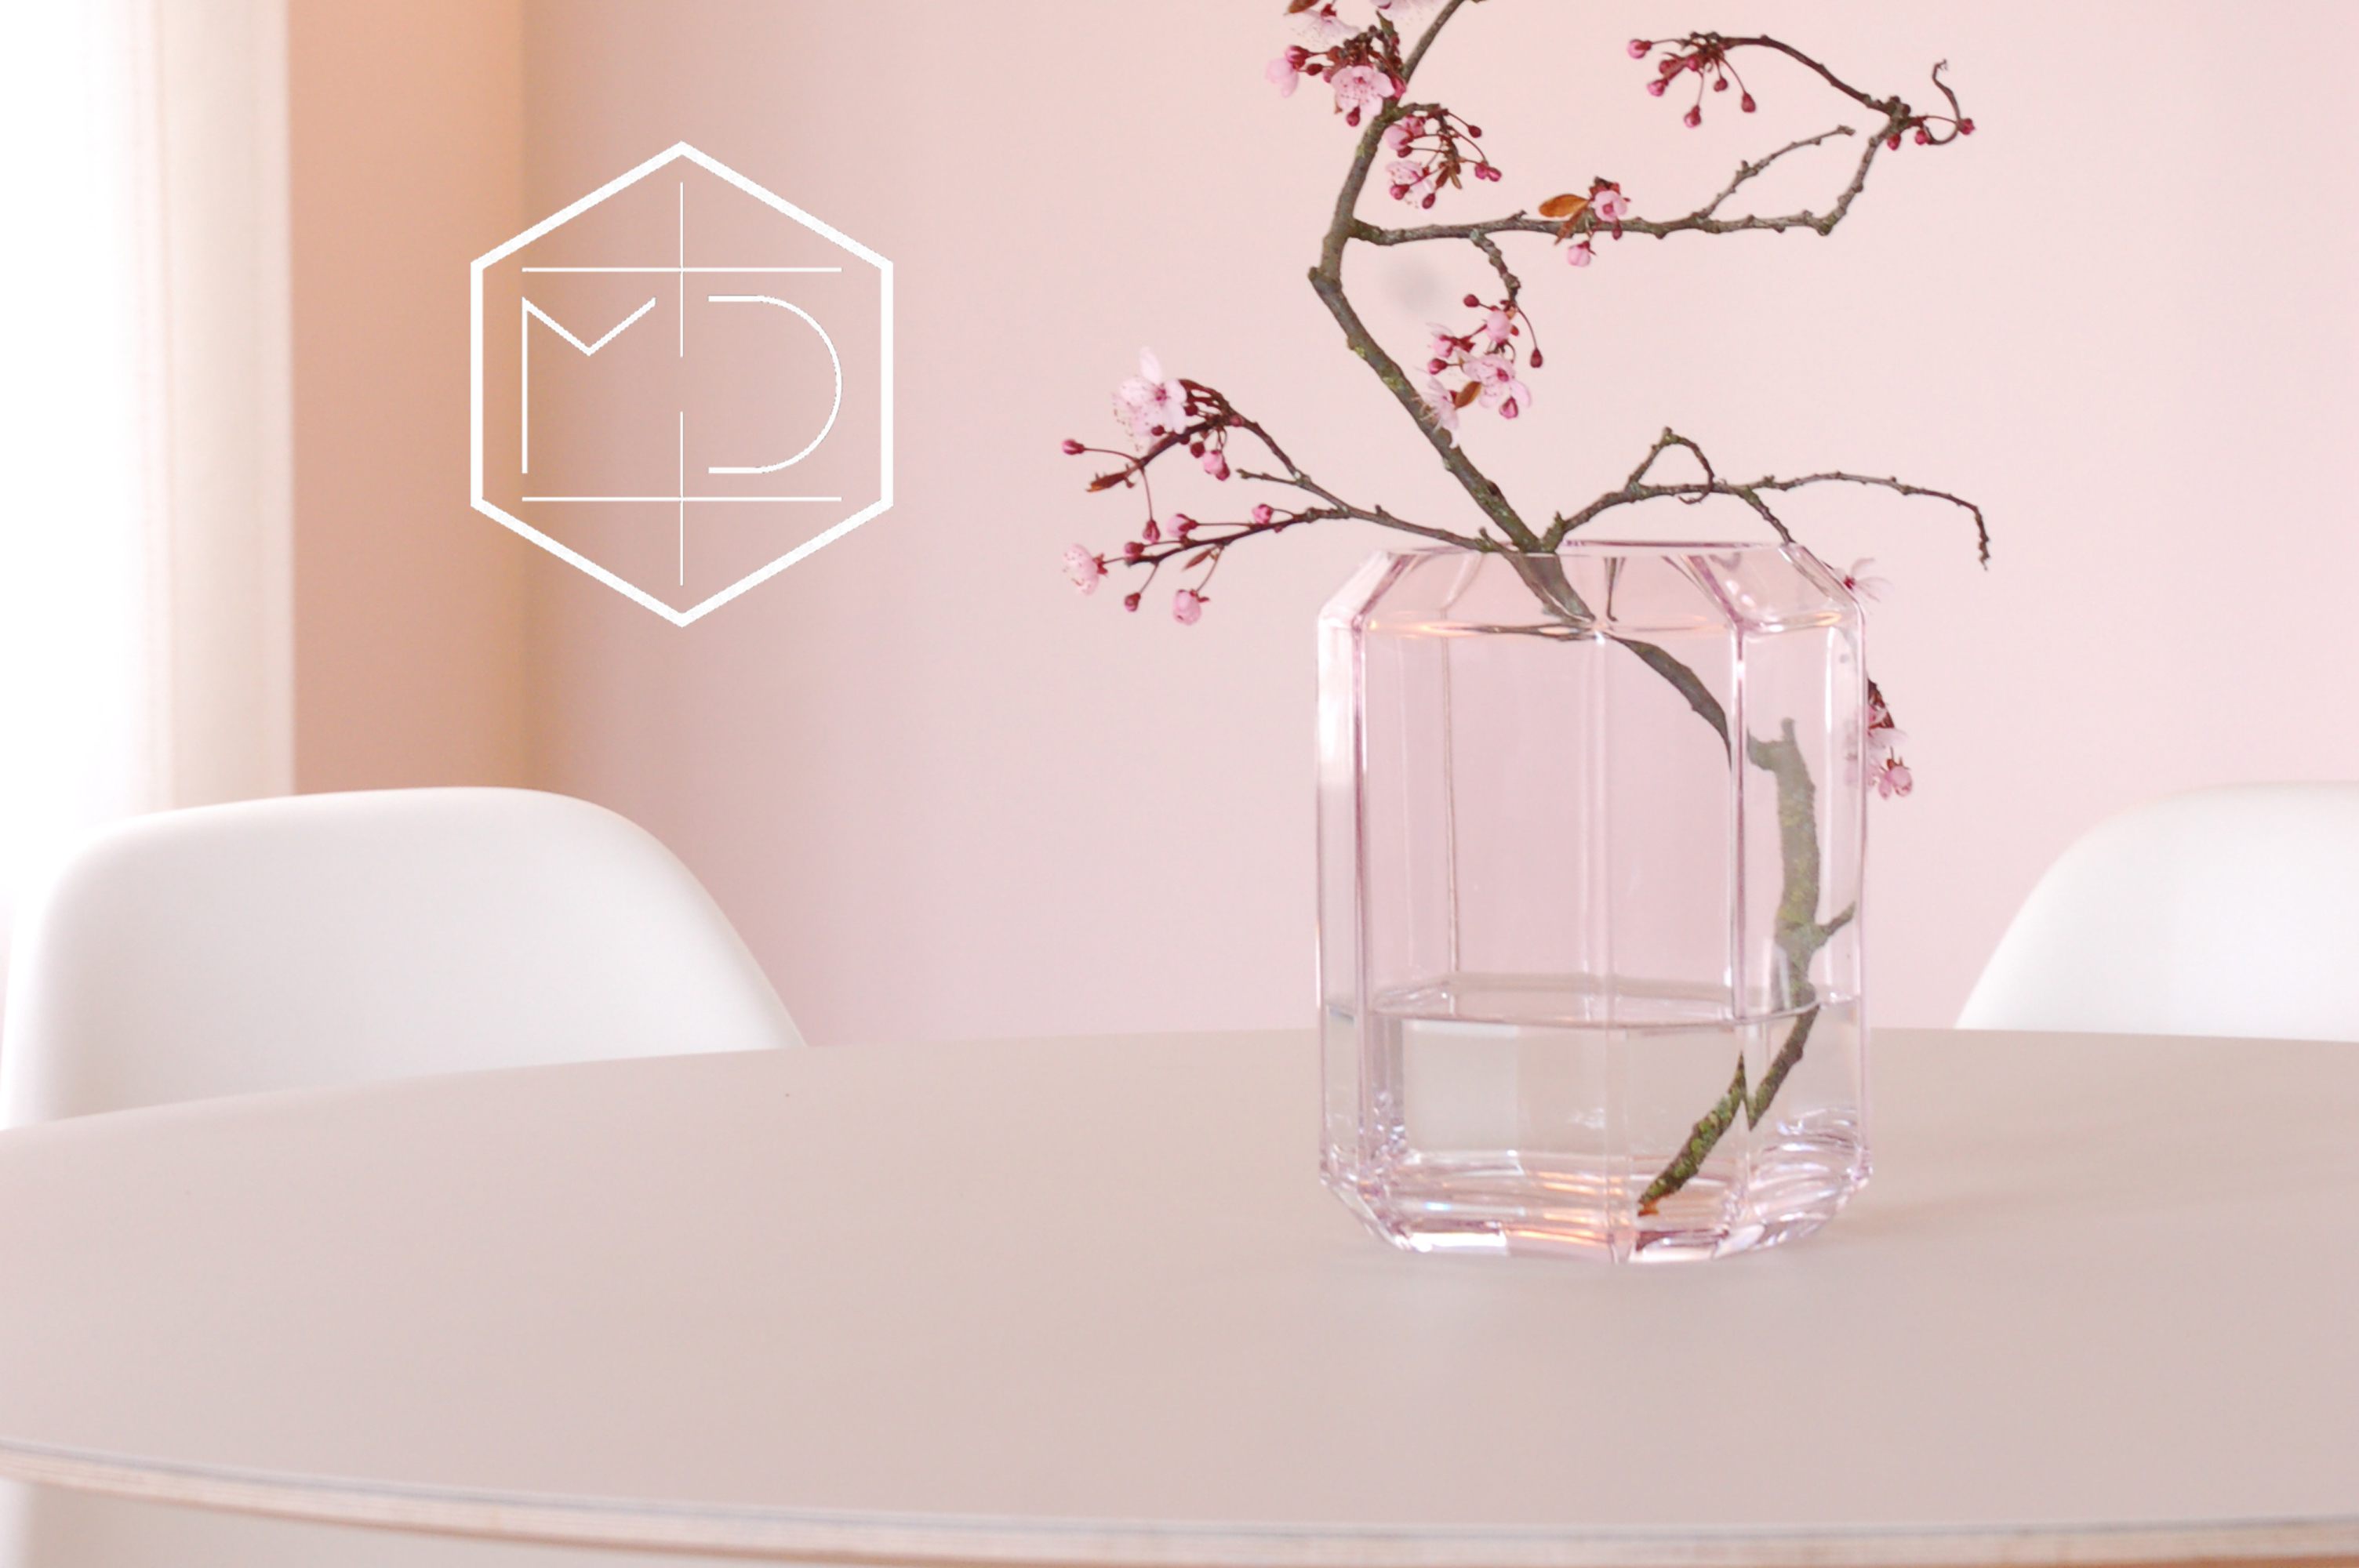 Mieke-Duindam-Interior-Design-interieurontwerp-advies-begeleiding (1)